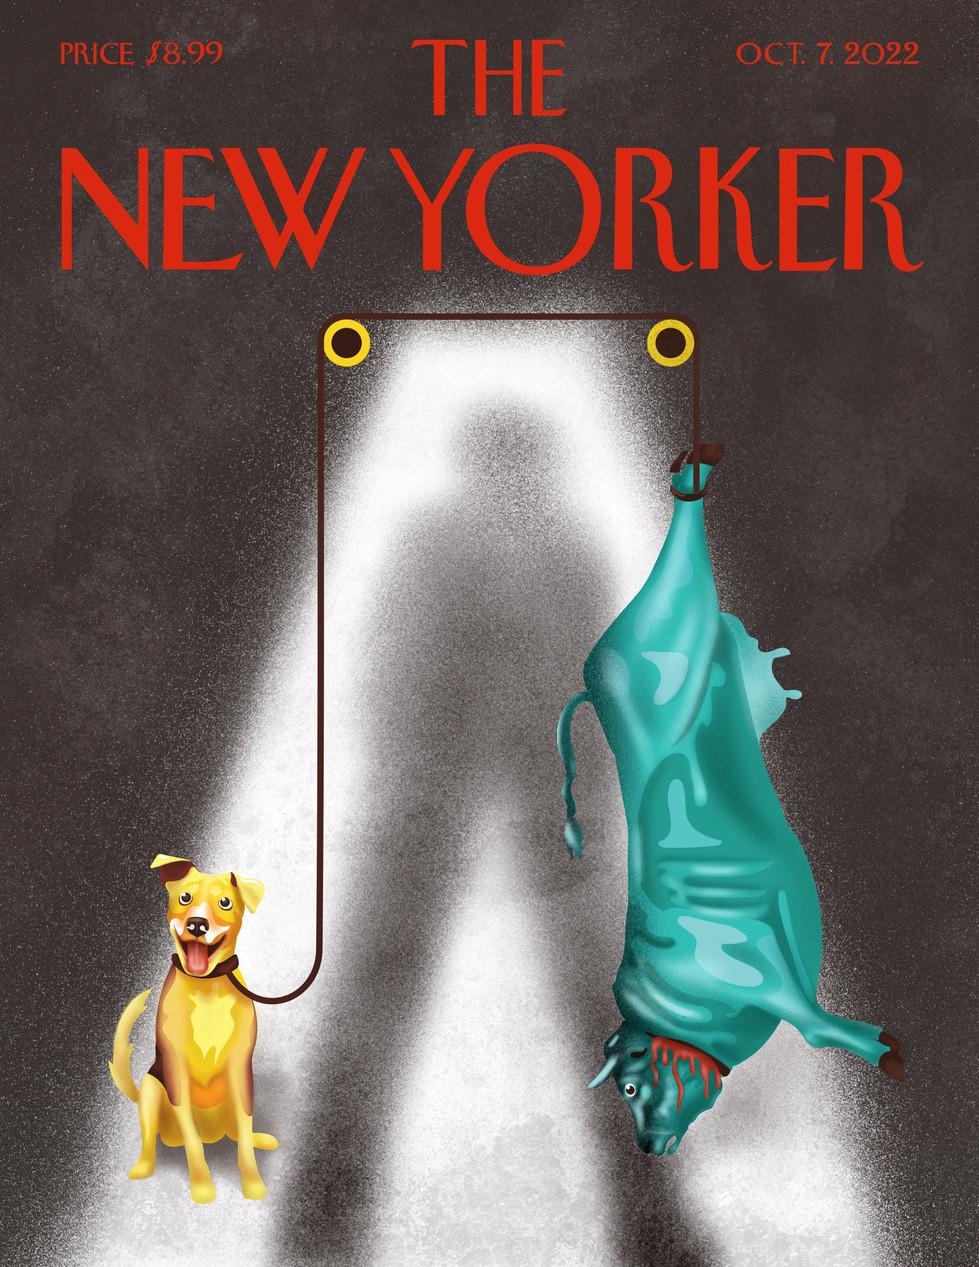 NewYorker - Cultural